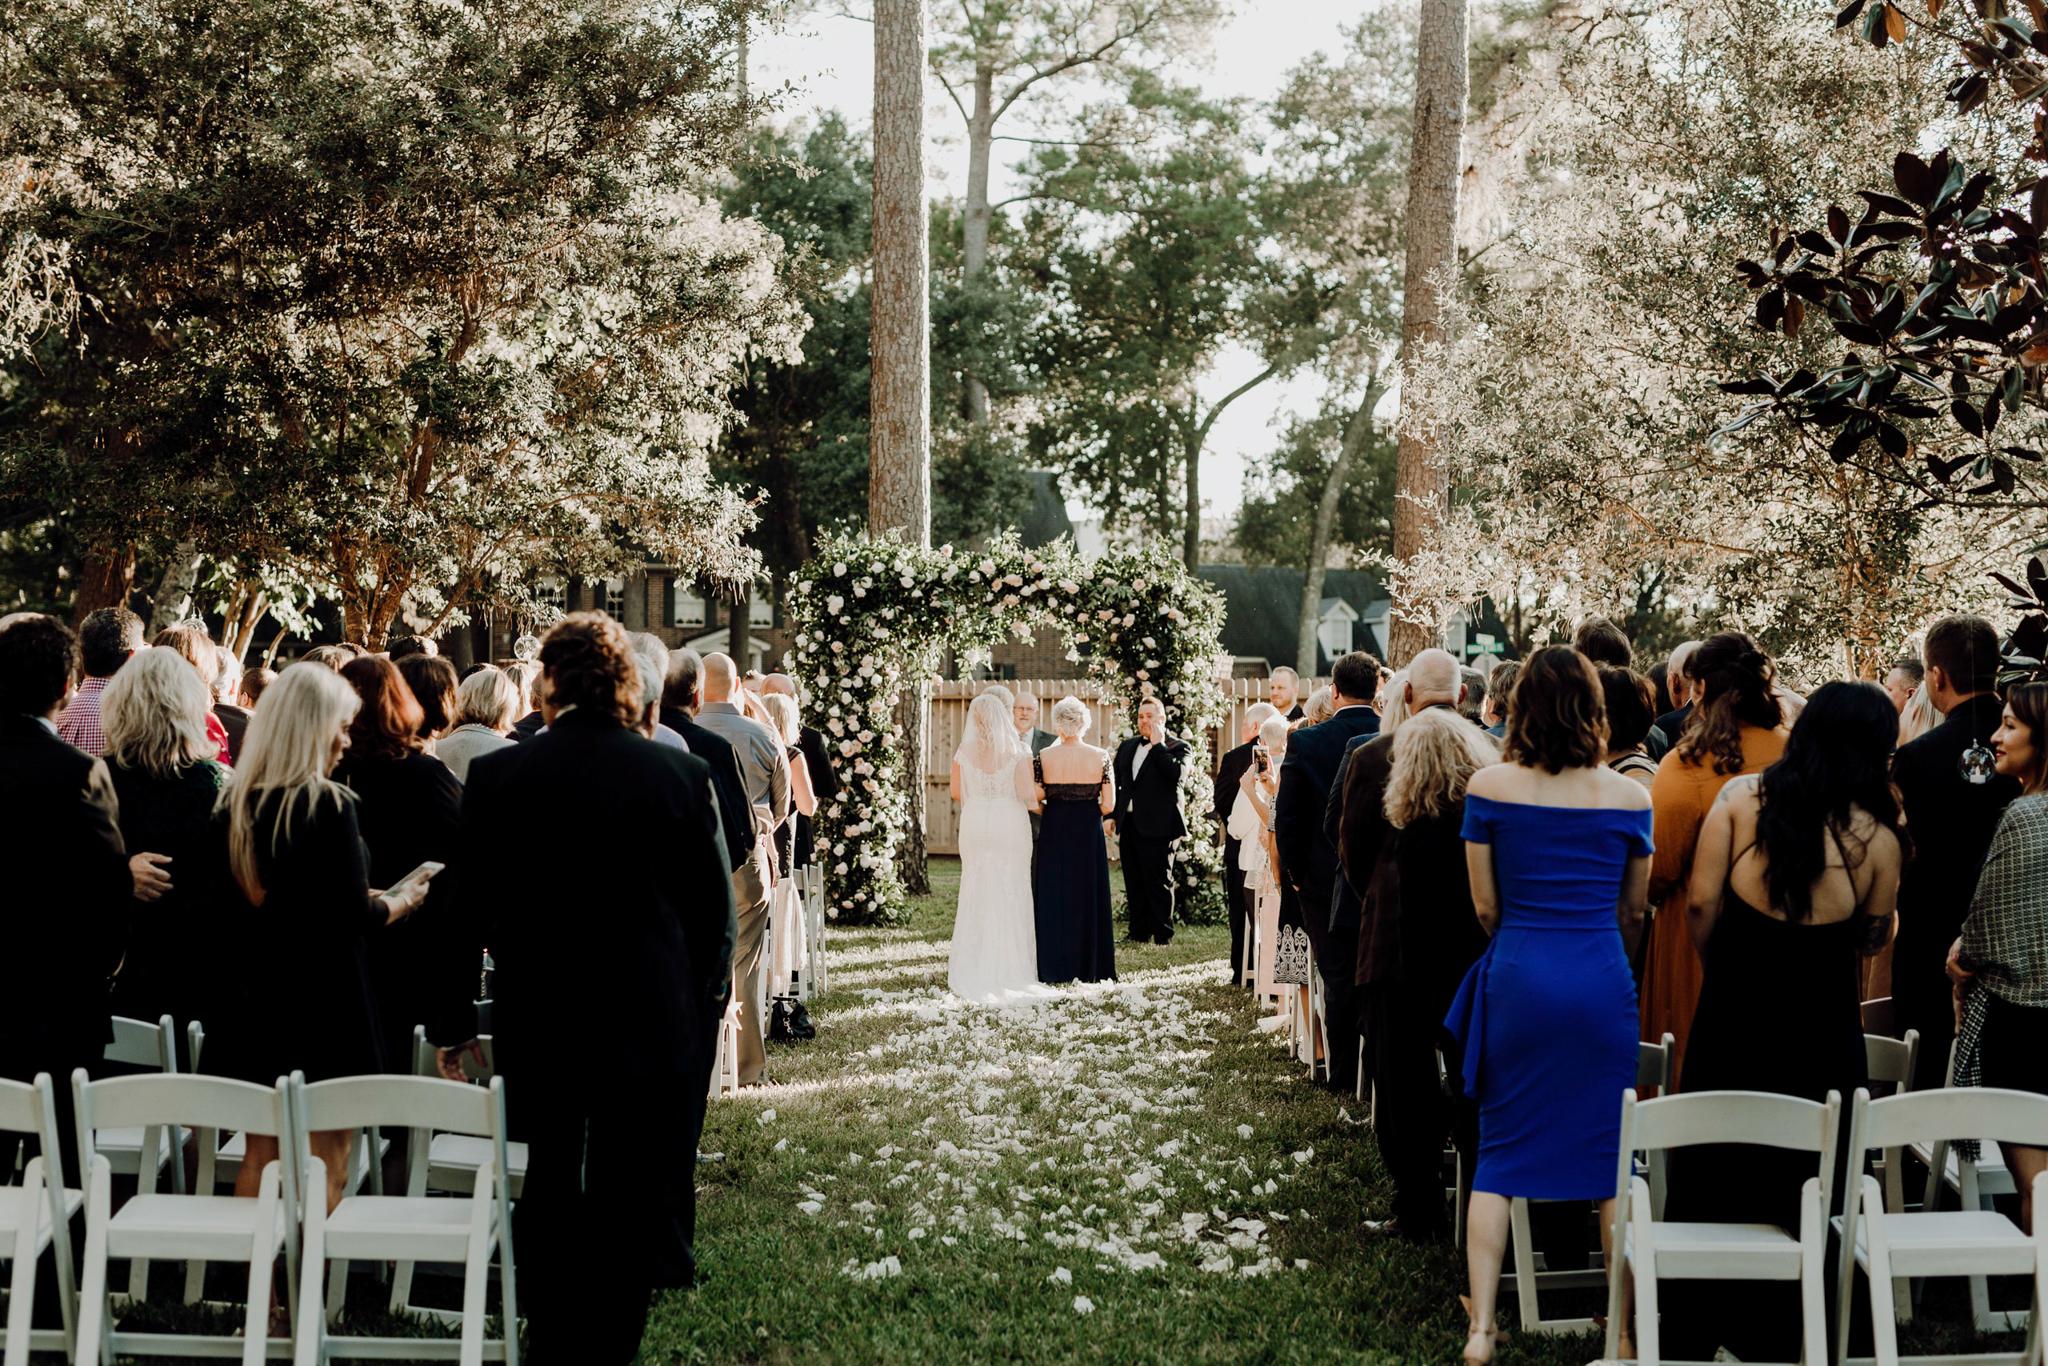 Houston Wedding Photographer-Intimate Texas Backyard Wedding- Houston Wedding Photographer -Kristen Giles Photography-43.jpg